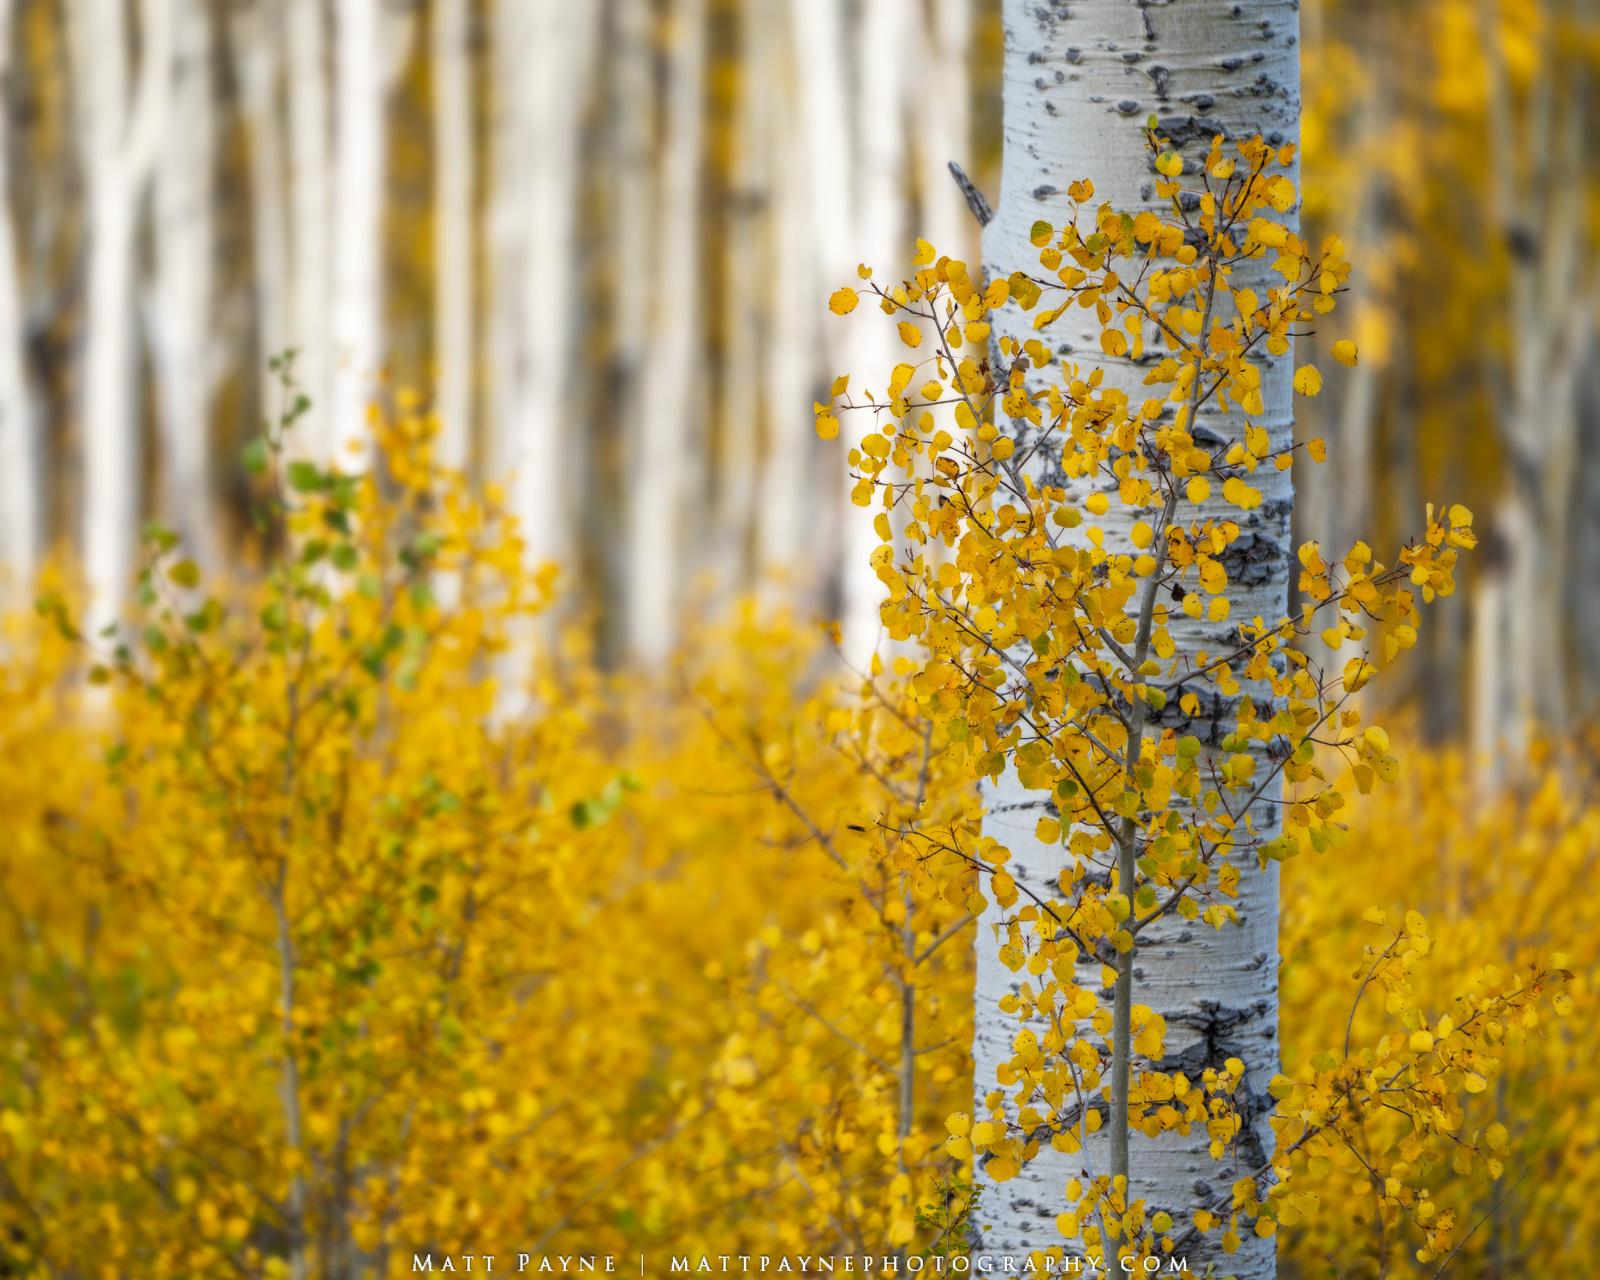 Aspen Trees, Autumn, Colorado, Fall, Fall Colors, Foliage, Landscape, aspen leaves, colorful, landscape photography, photo